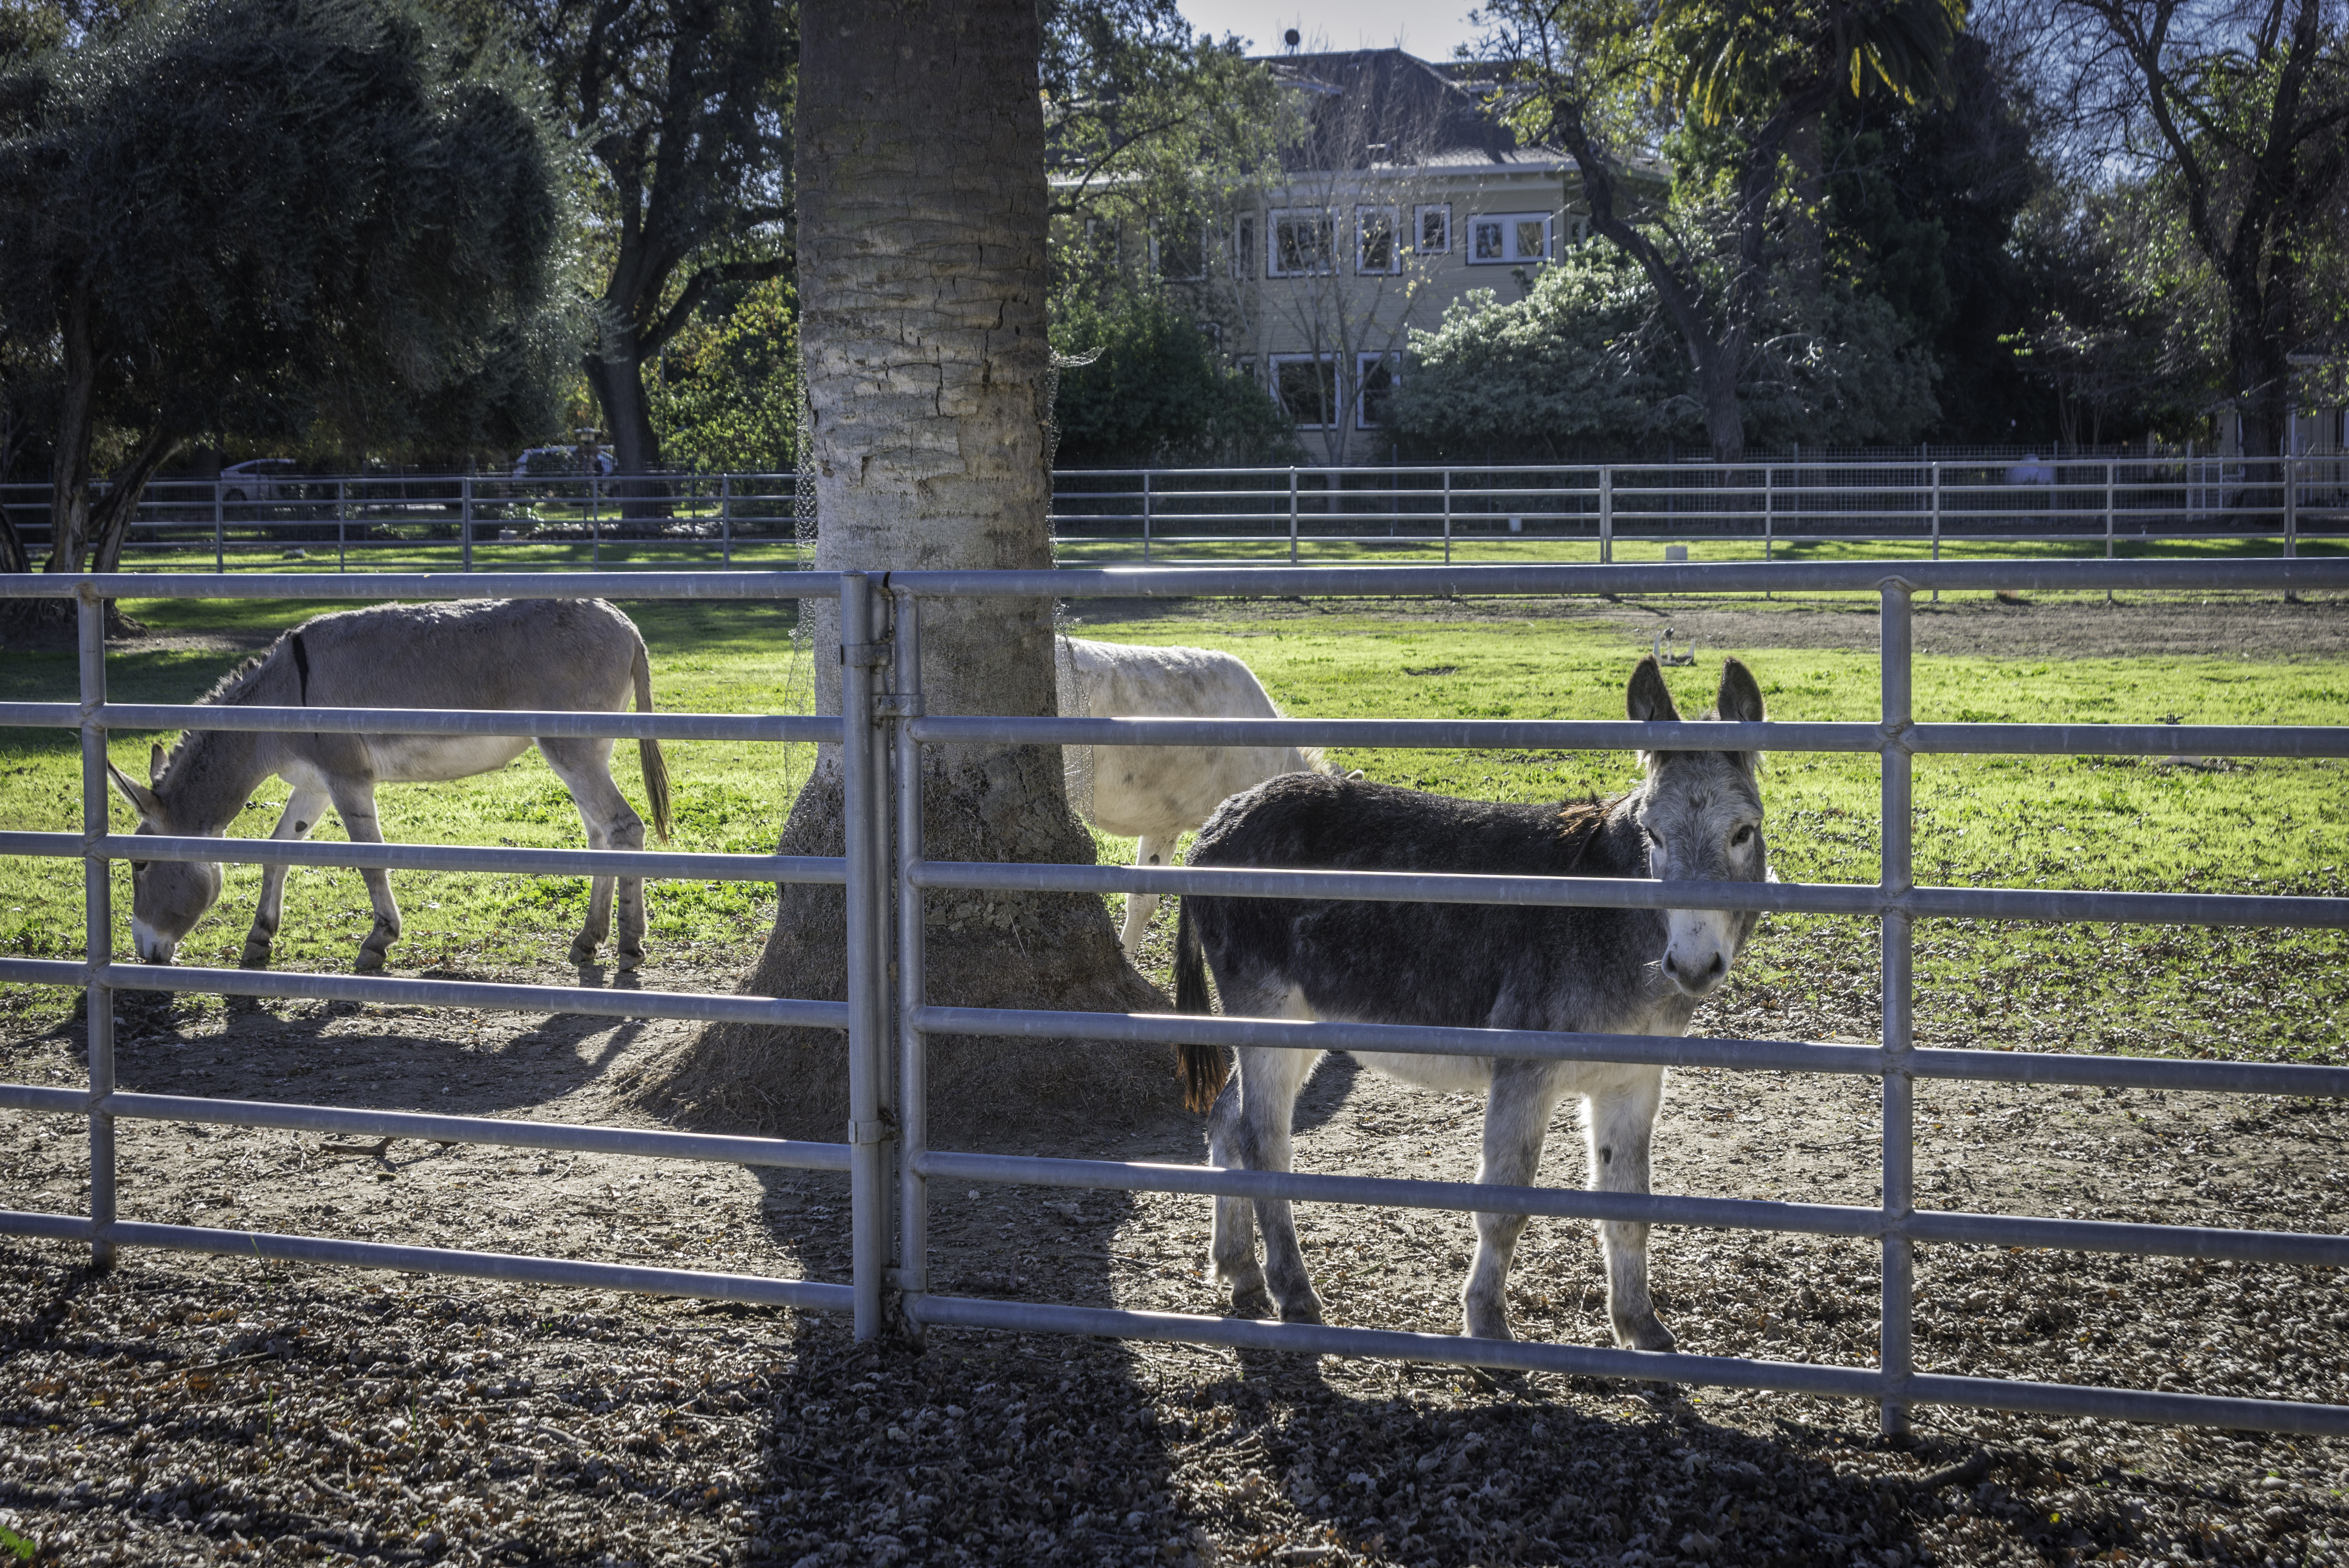 Donkey 101: Davis, CA December 2&3, 2017